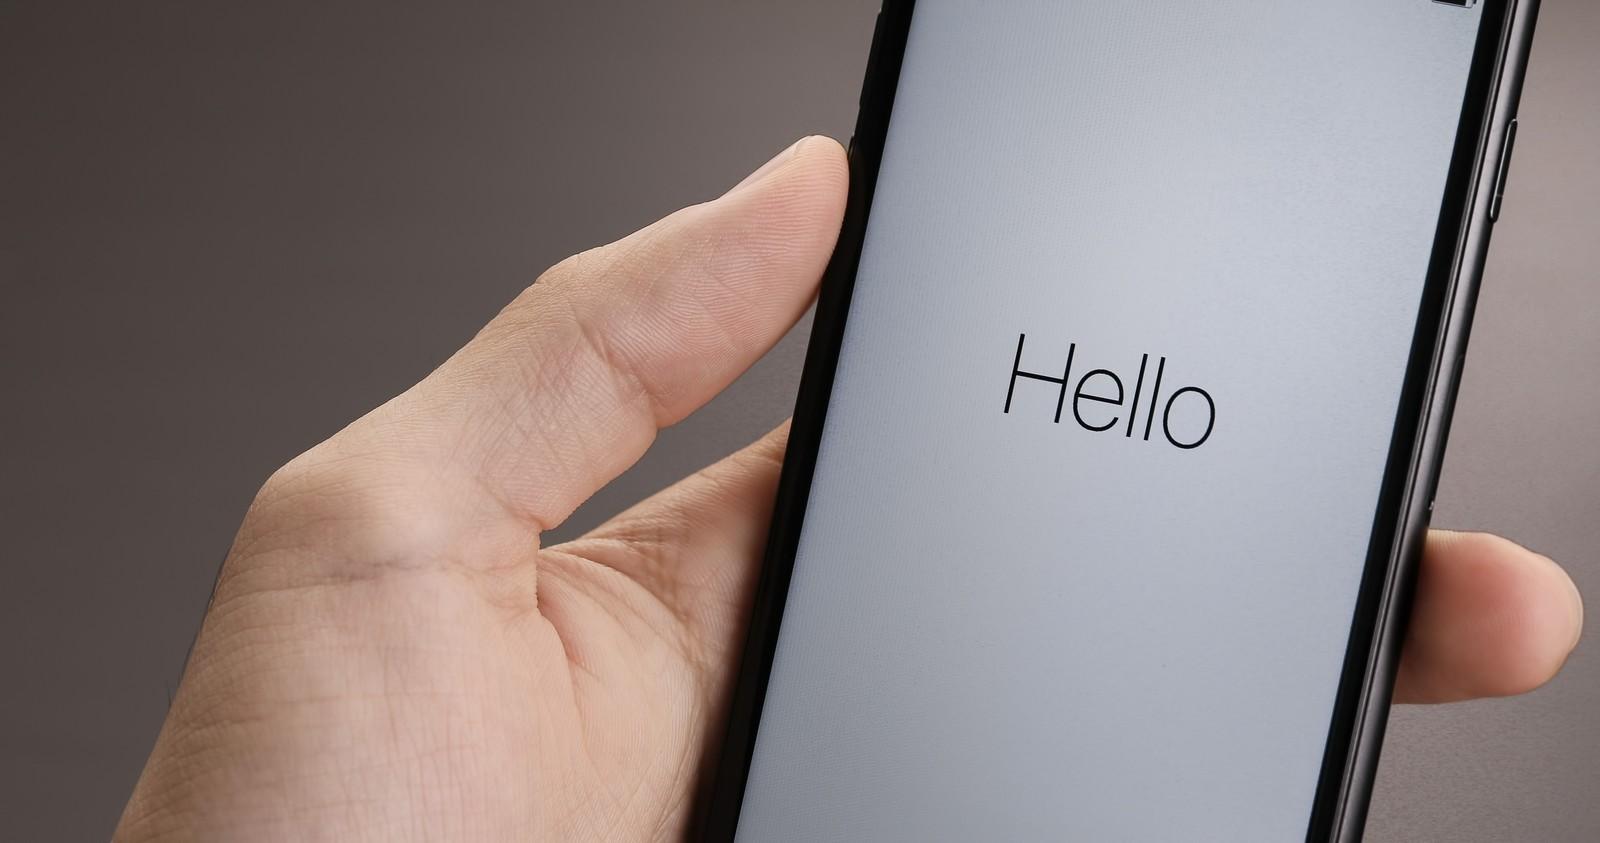 iPhoneの「手前に傾けてスリープ解除」を設定オフにする方法【iOS】